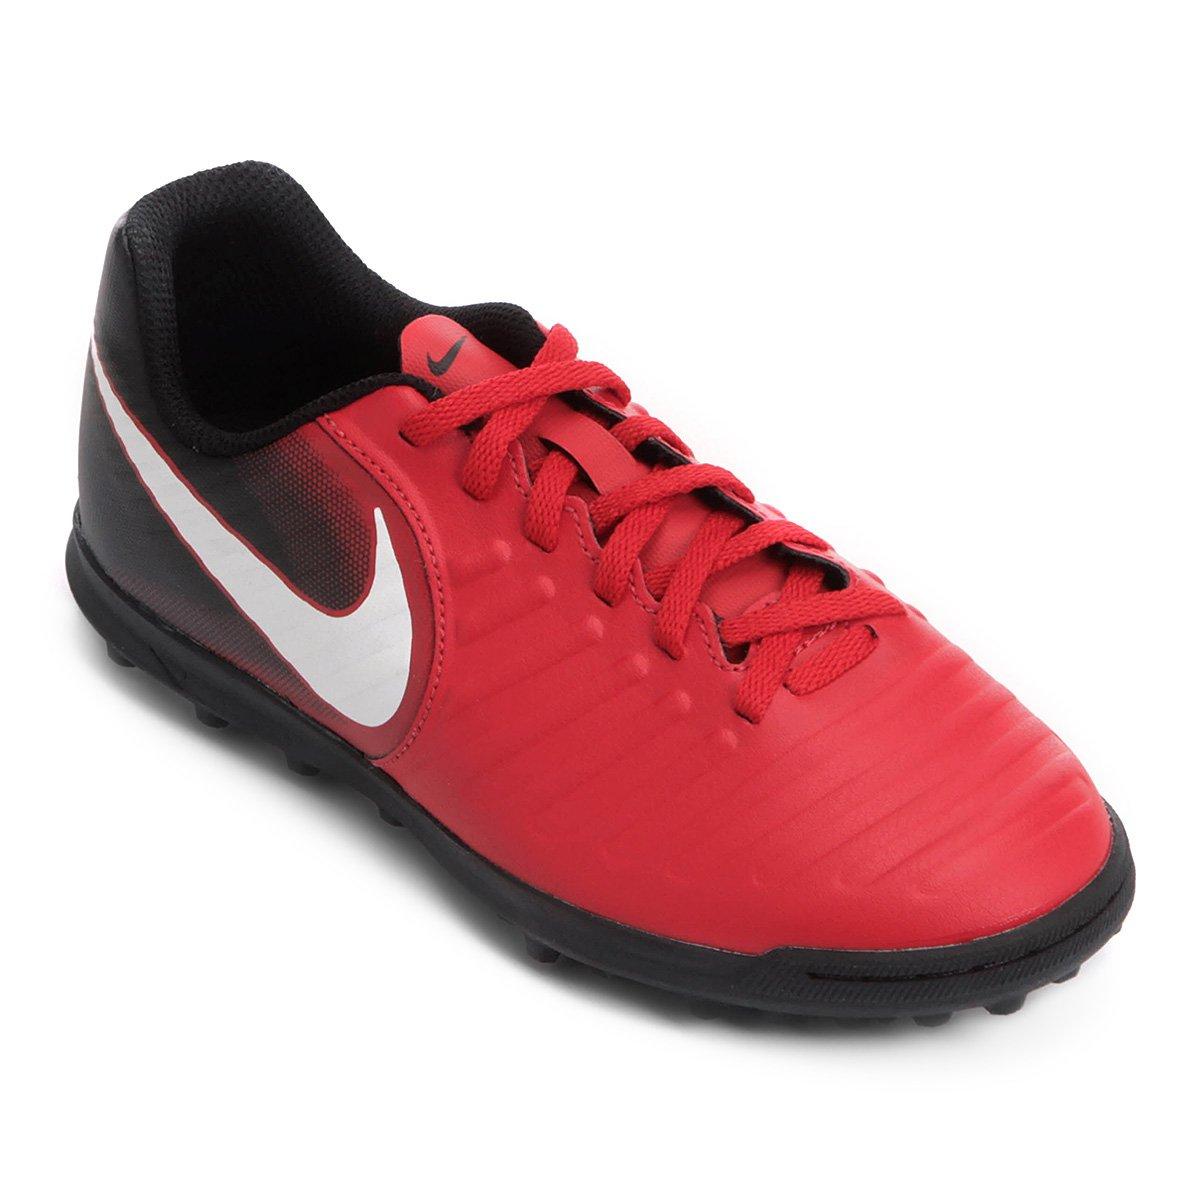 275ca6fcc3b40 Chuteira Society Infantil Nike Tiempo Rio 4 IC TF - Compre Agora ...